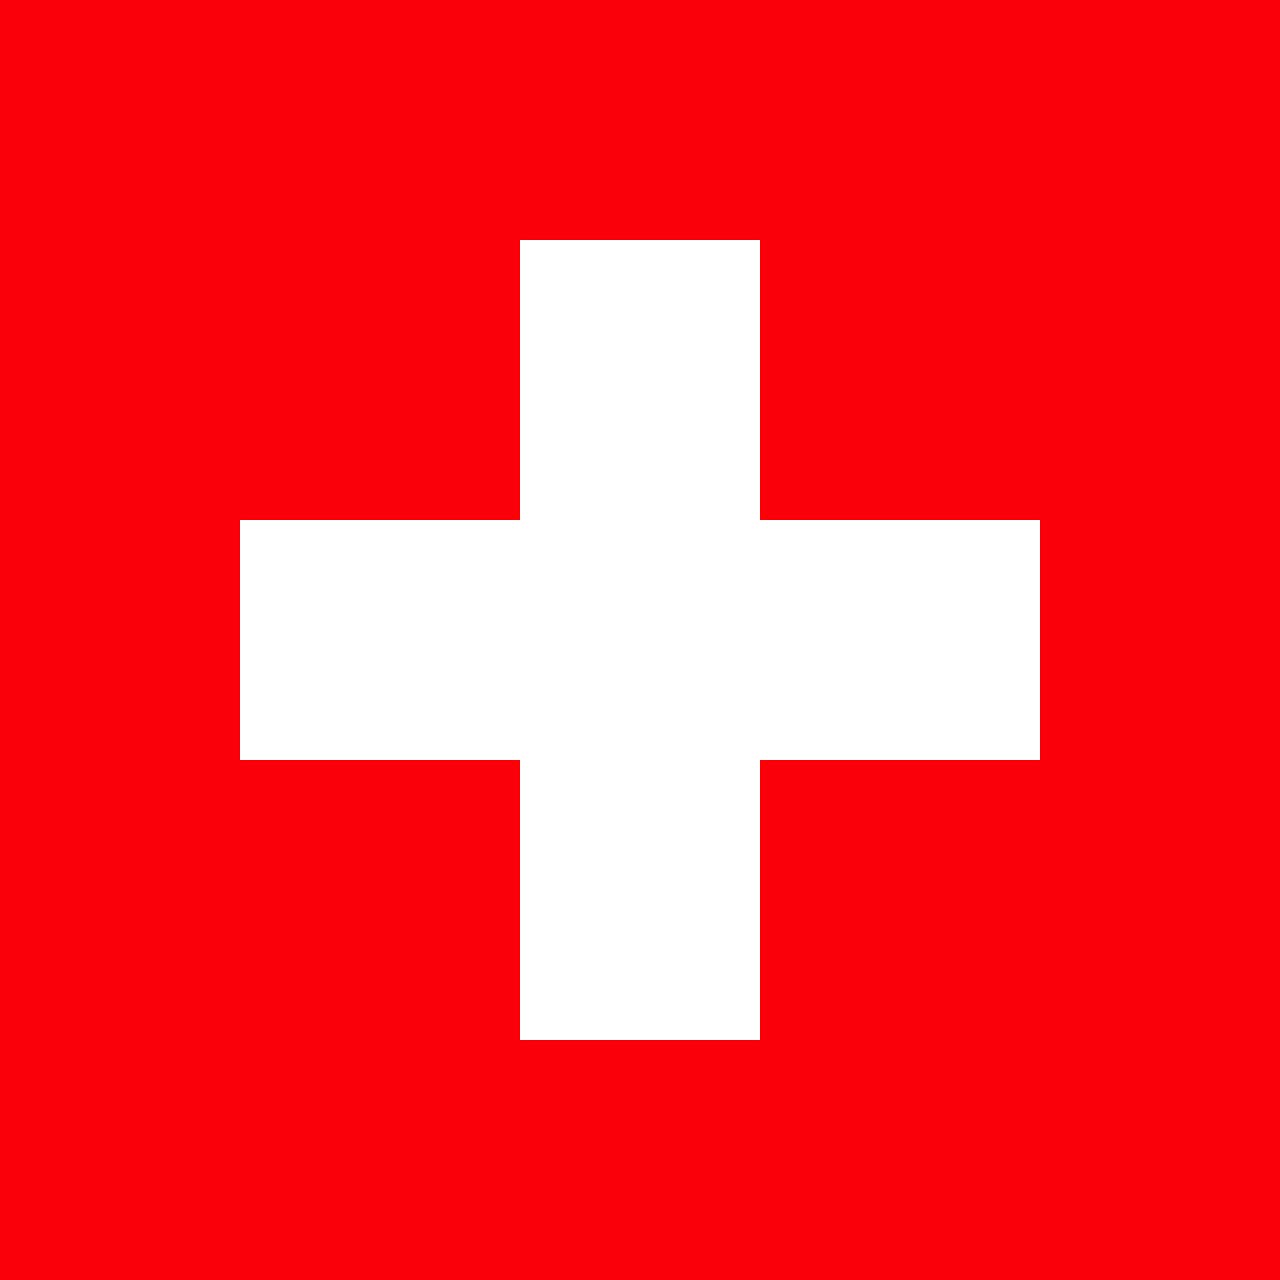 Bild Fahne Schweiz